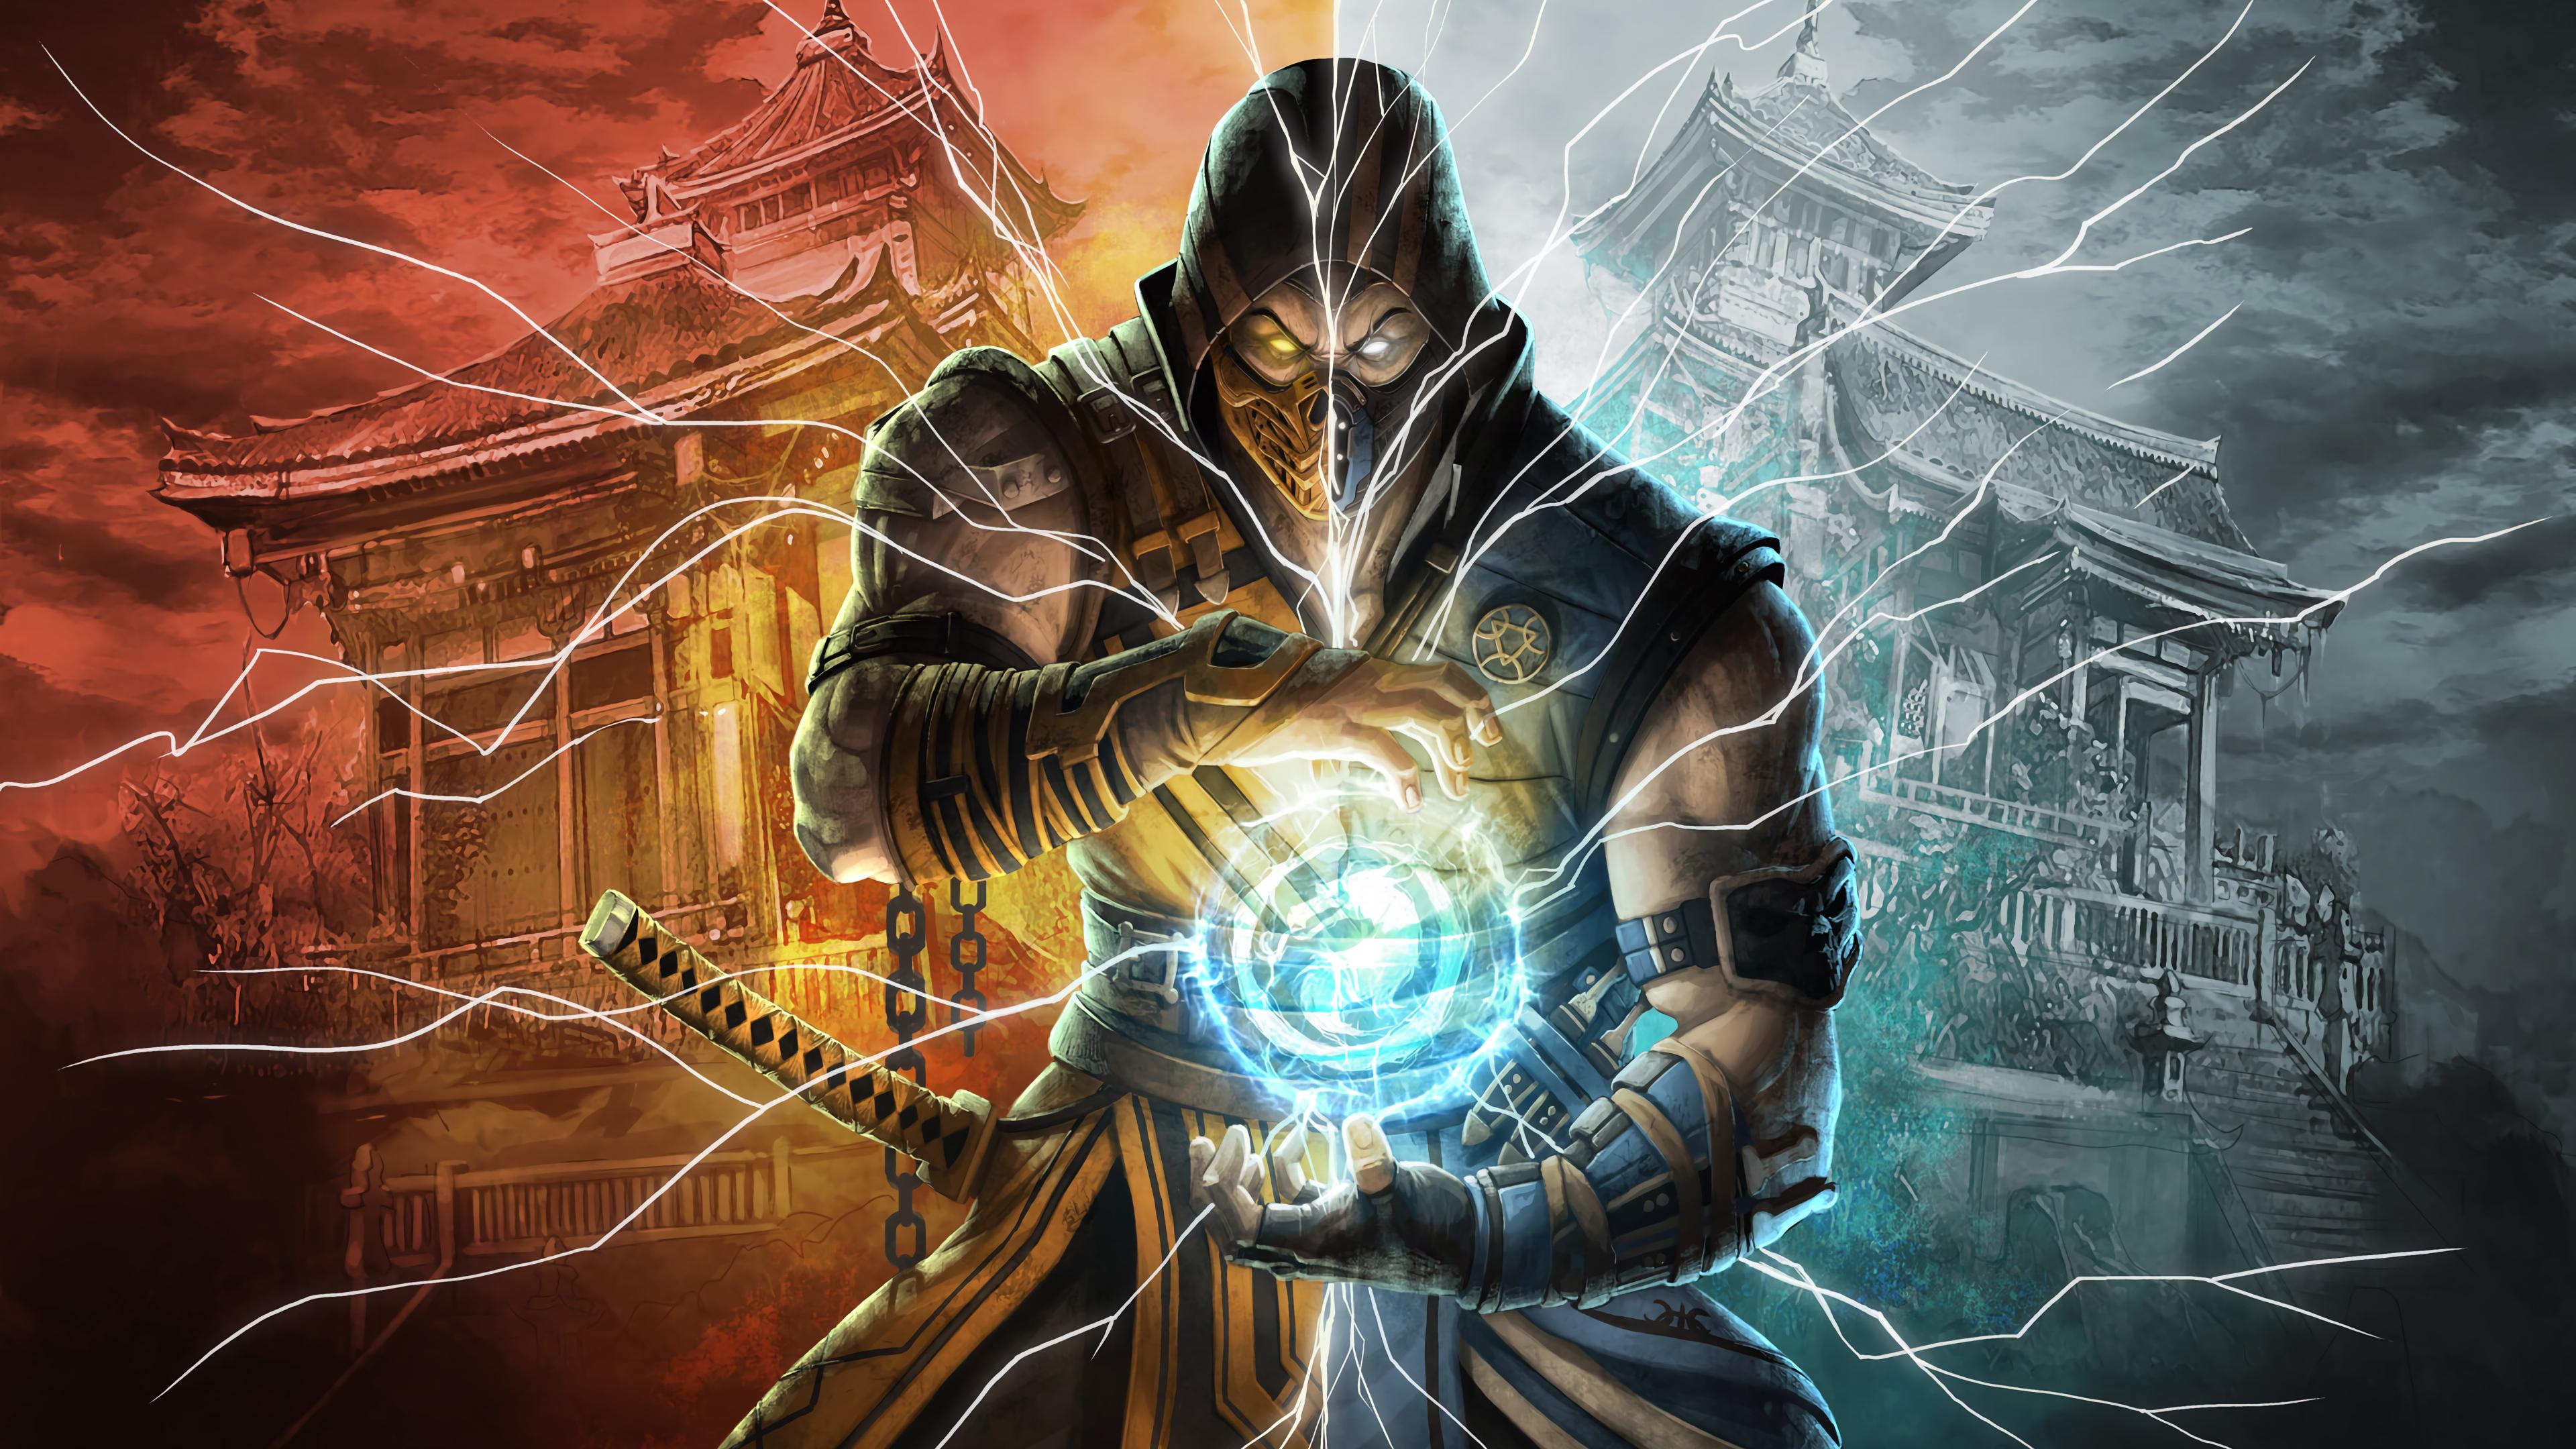 3840x2160 2019 Mortal Kombat 11 4k Hd 4k Wallpapers Images